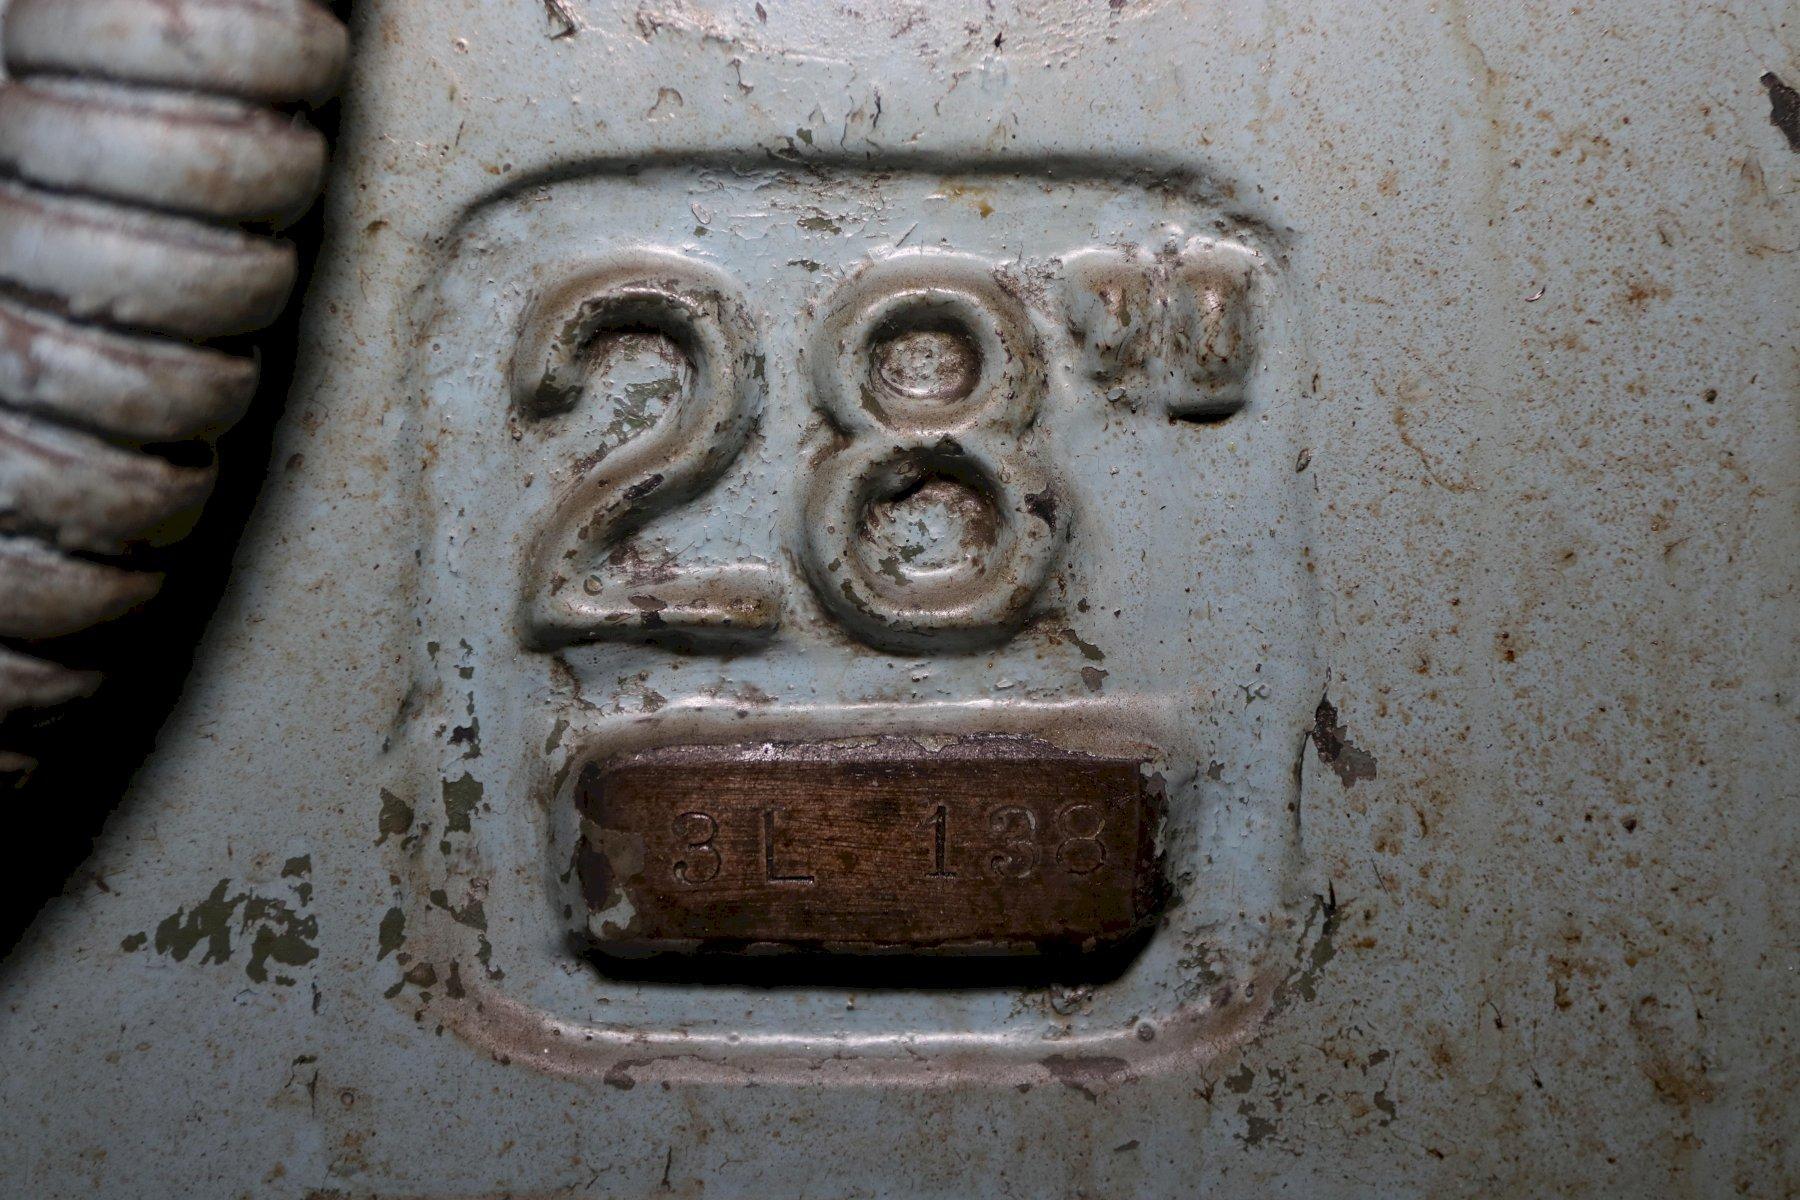 "28"" CINCINNATI BICKFORD MODEL #28 SINGLE SPINDLE DRILL: STOCK #12081"